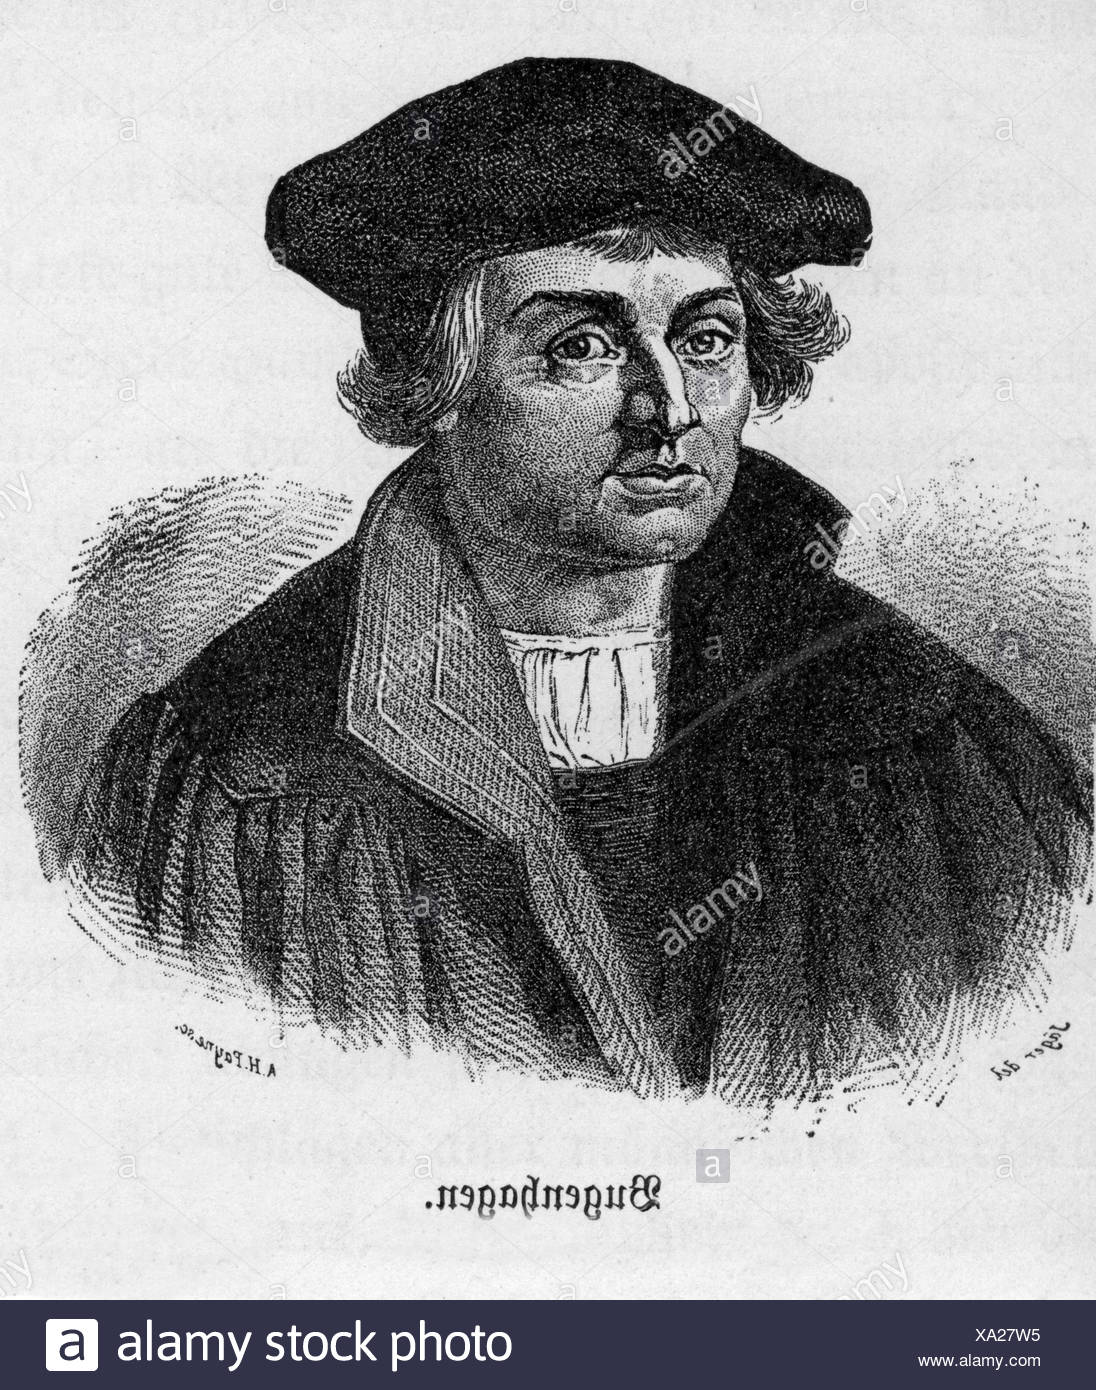 Bugenhagen Johannes 24 6 1485 20 4 1558 German reformer portrait steel engraving by Albert Henry Payne 1812 1902 19 - Stock Image